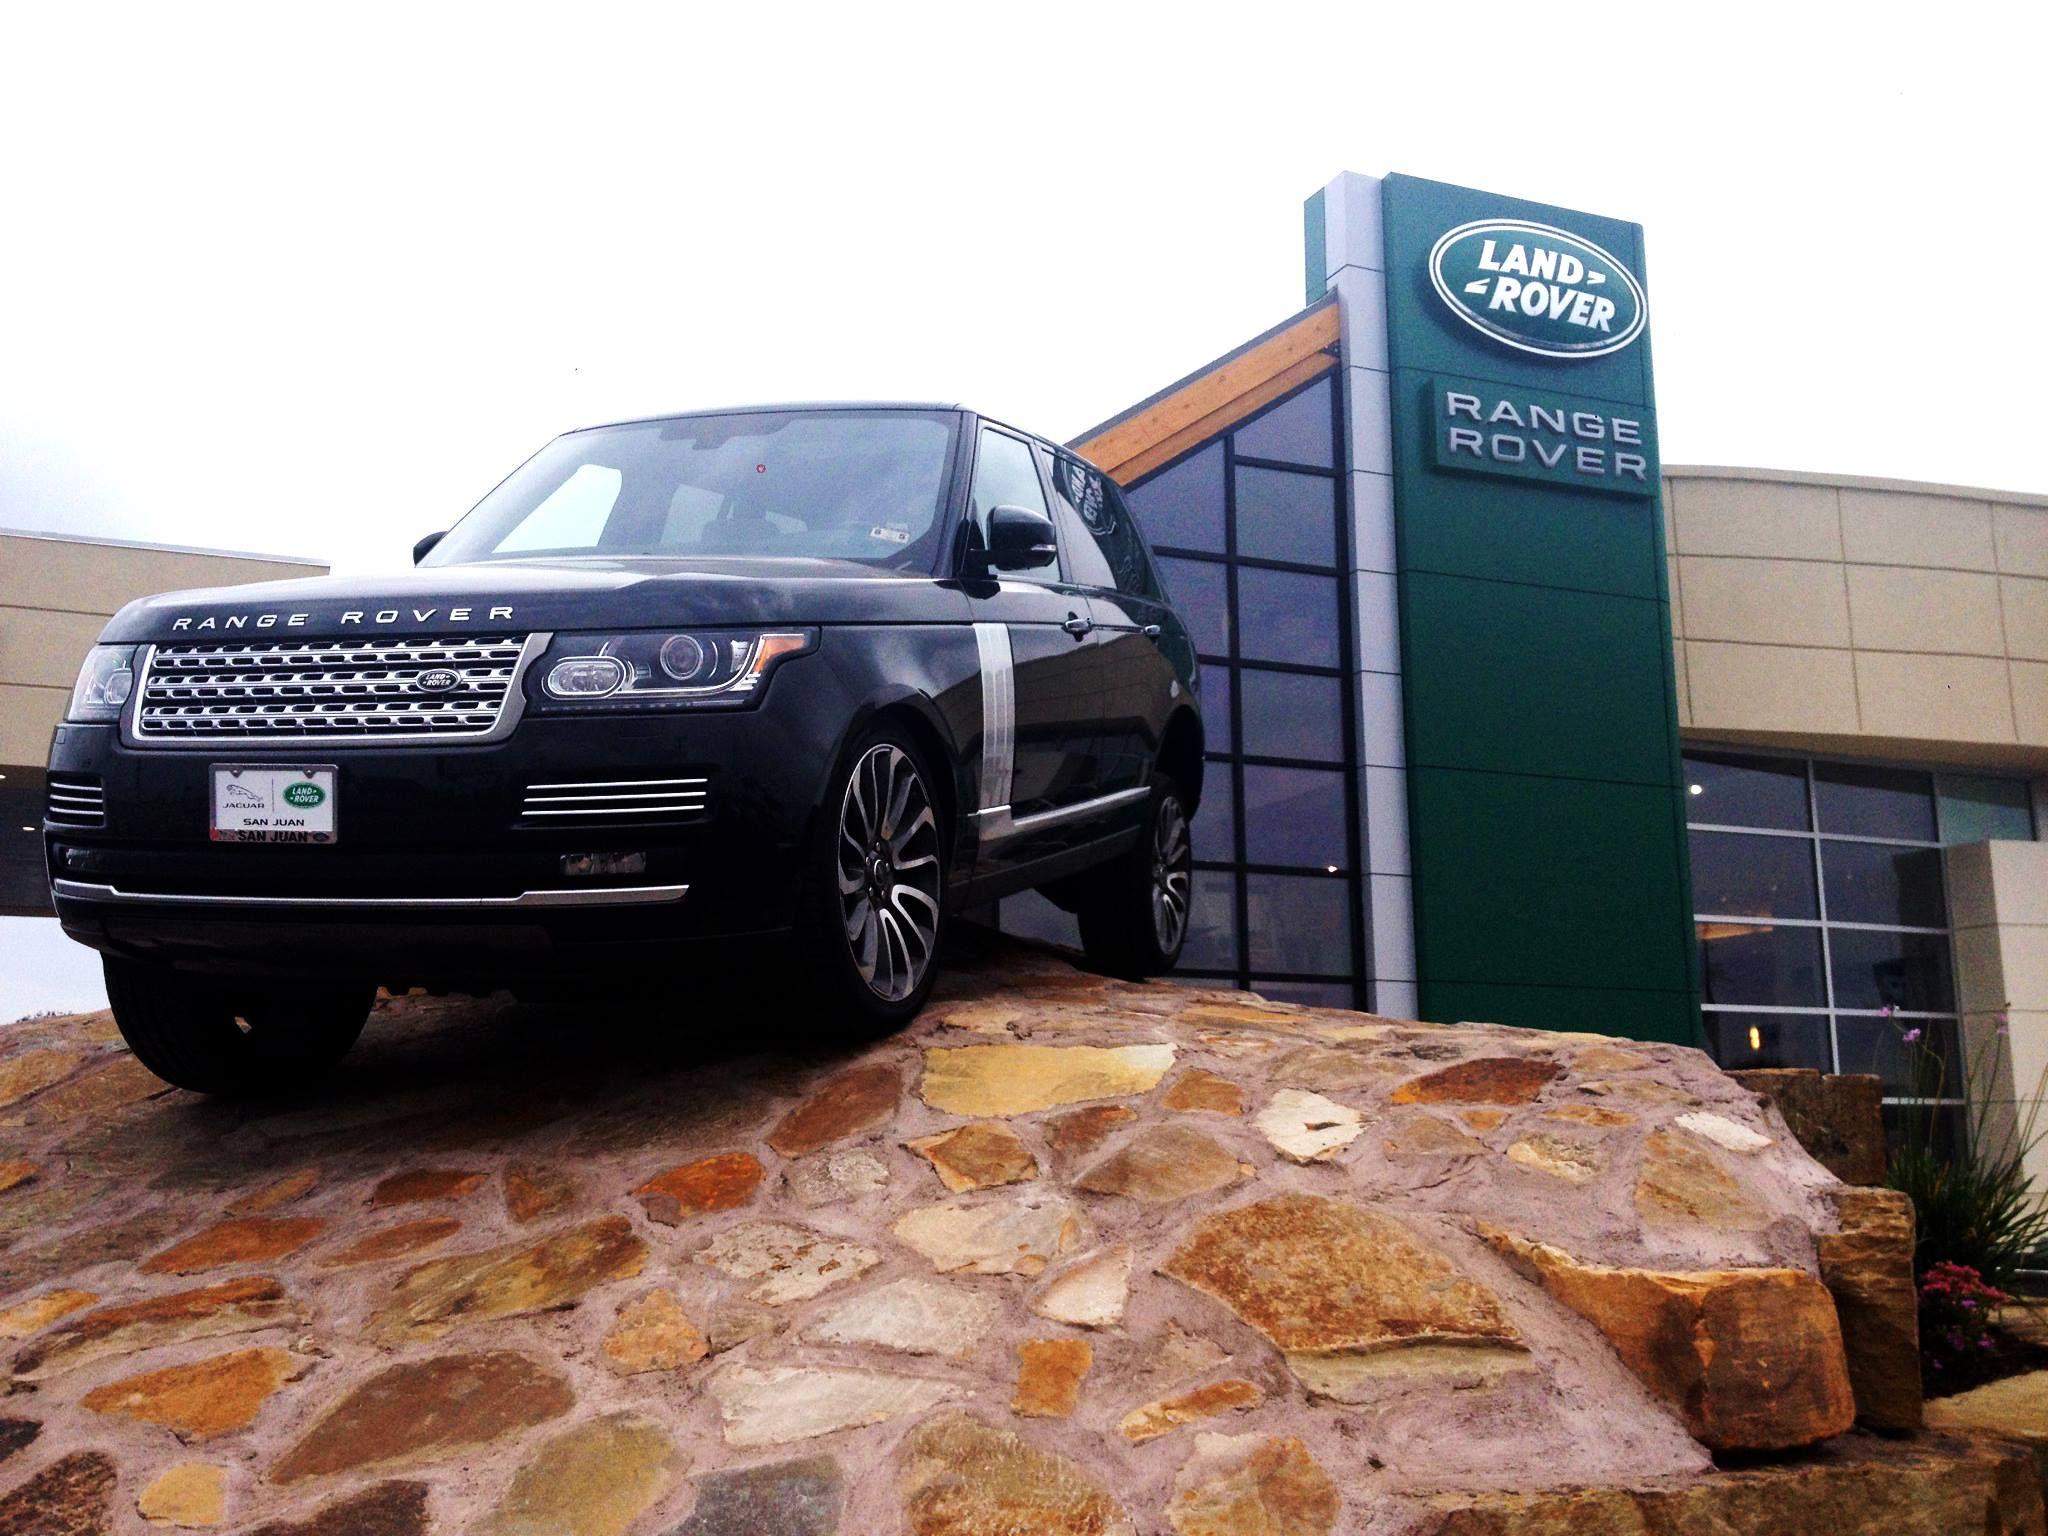 Ask About Ordering A New Range Rover At Landrover Sanjuan Texas Www Jlrofsj Com Jaguar Land Rover Land Rover Range Rover